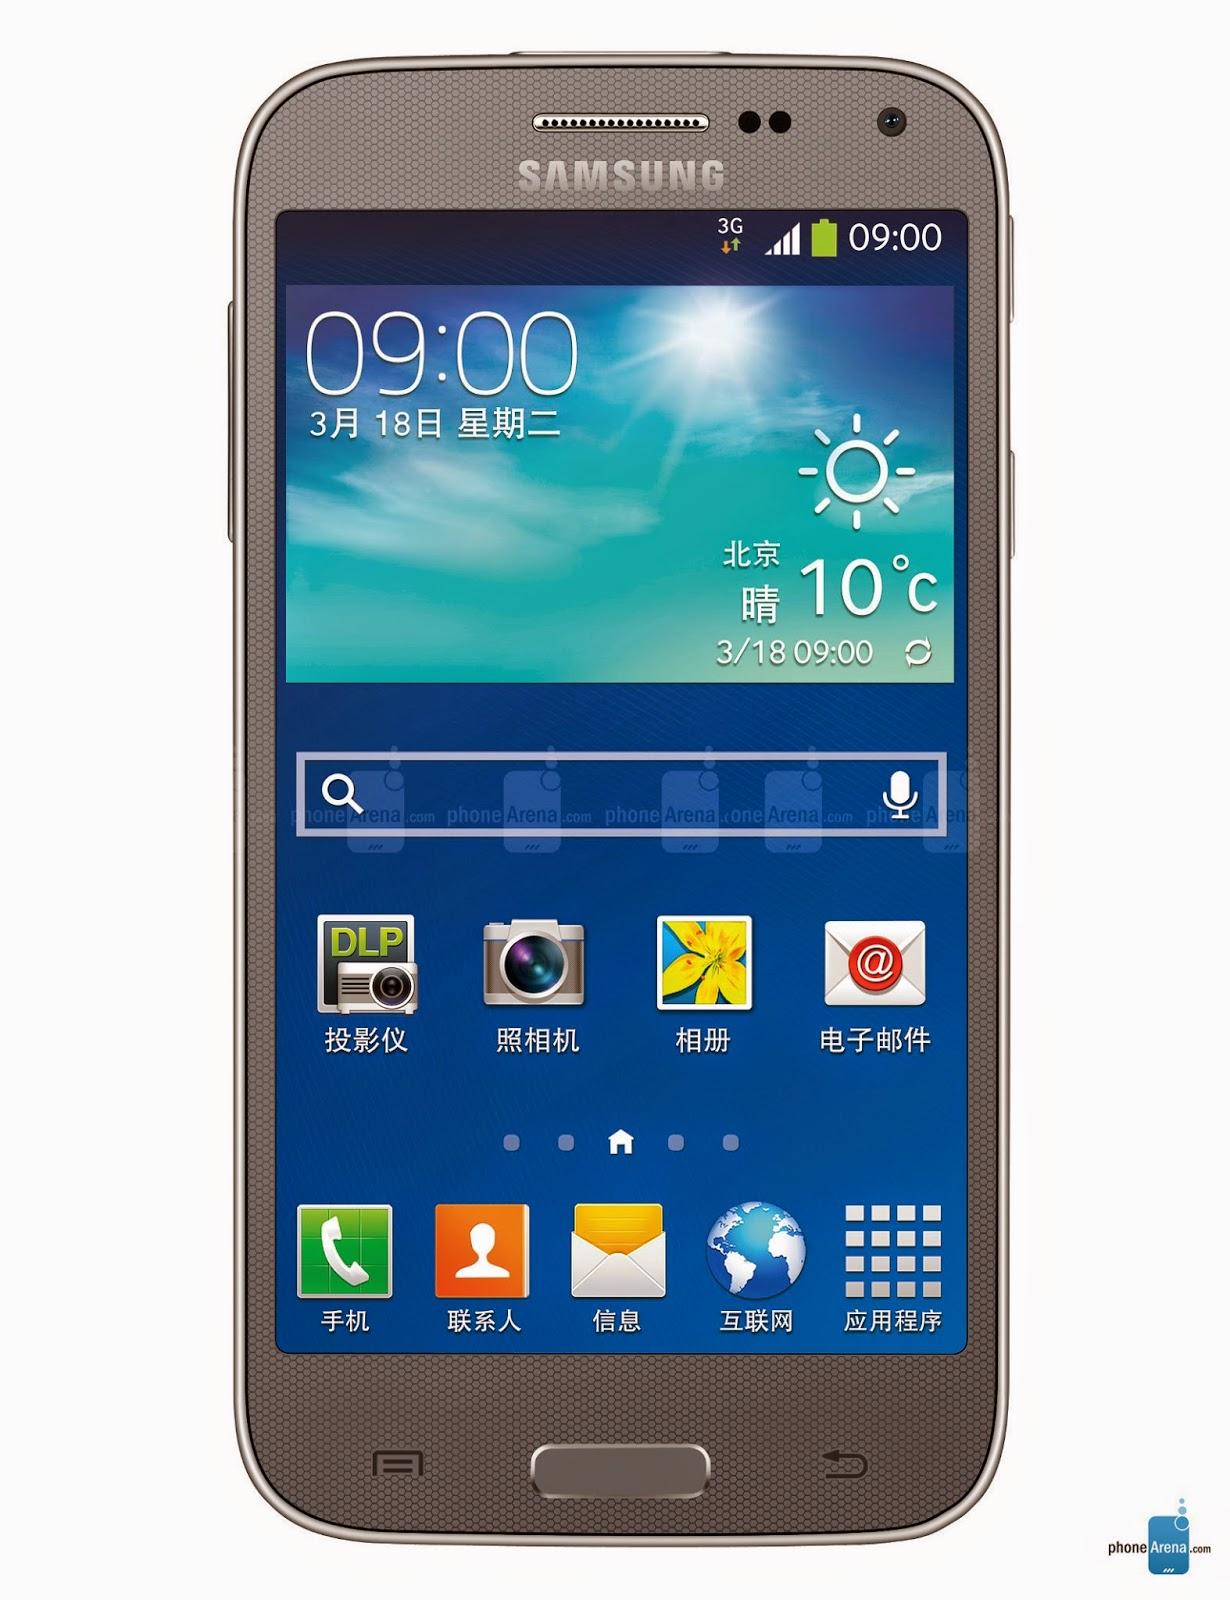 Samsung Galaxy Ace NXT SM-G313HZ BNG Unknow 4.4.2 KitKat